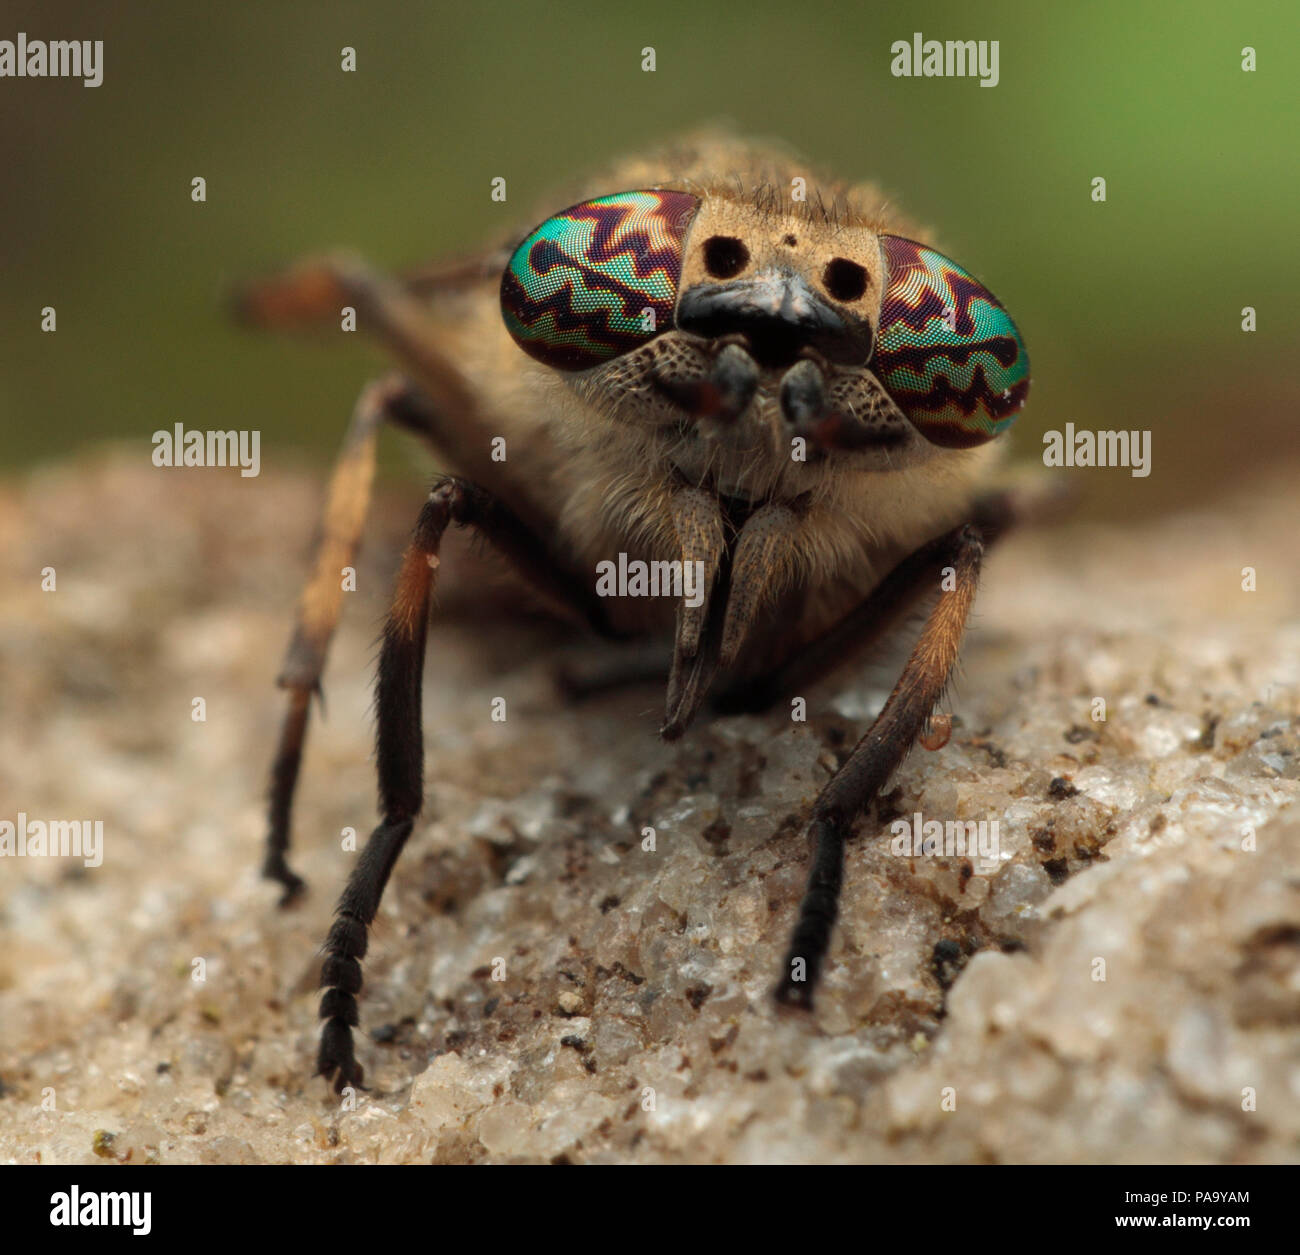 Horse fly compound eyes - Stock Image